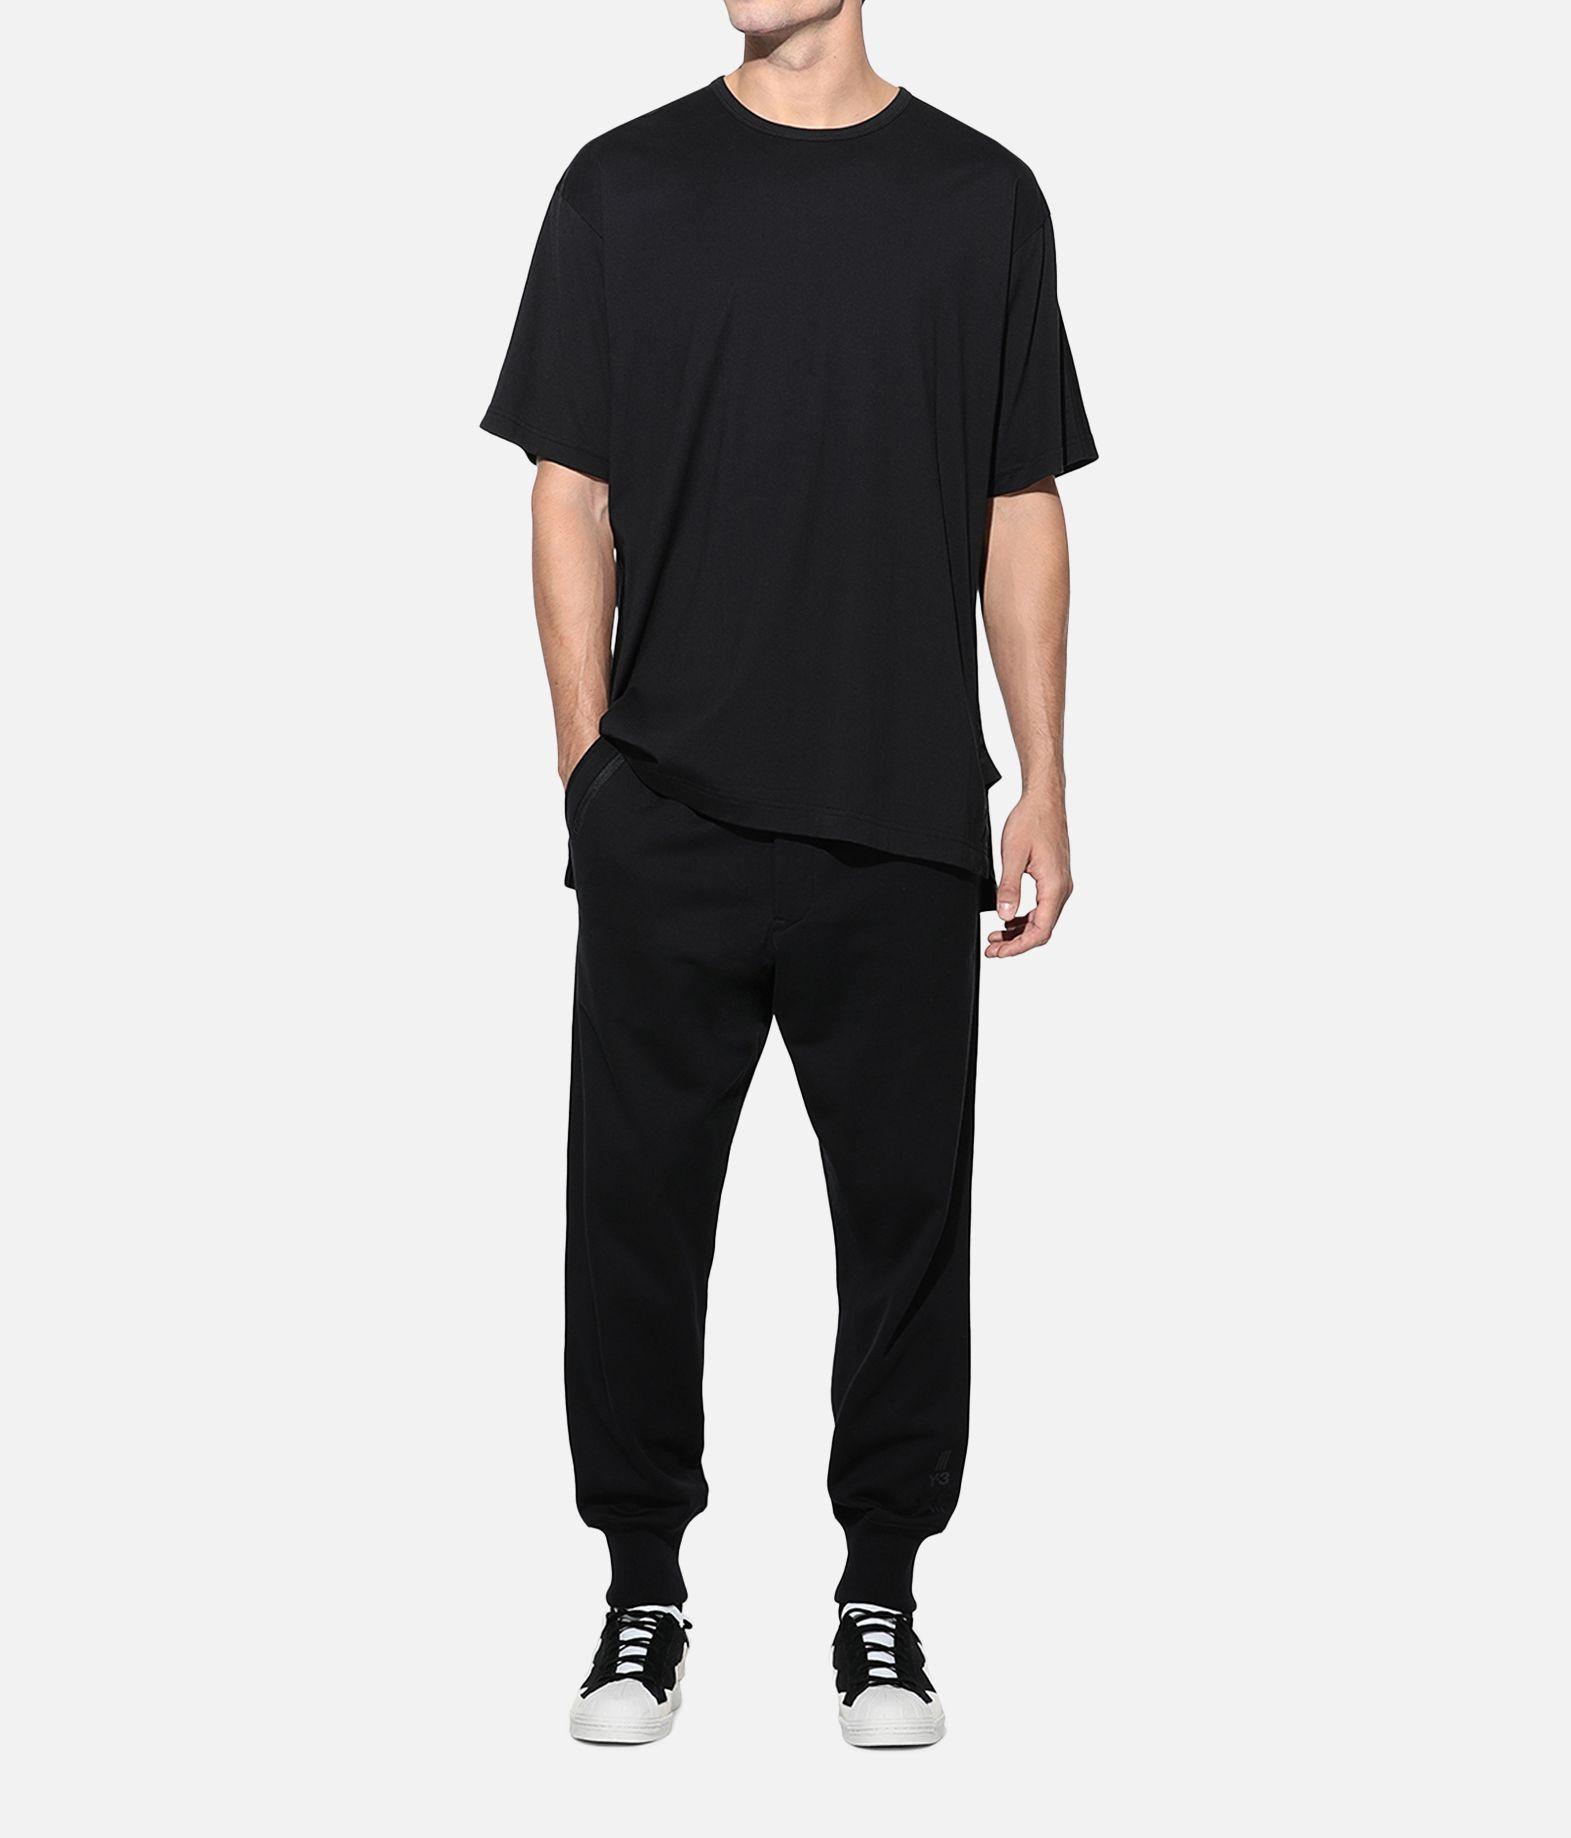 Y-3 Y-3 Parachute Tee Short sleeve t-shirt Man a